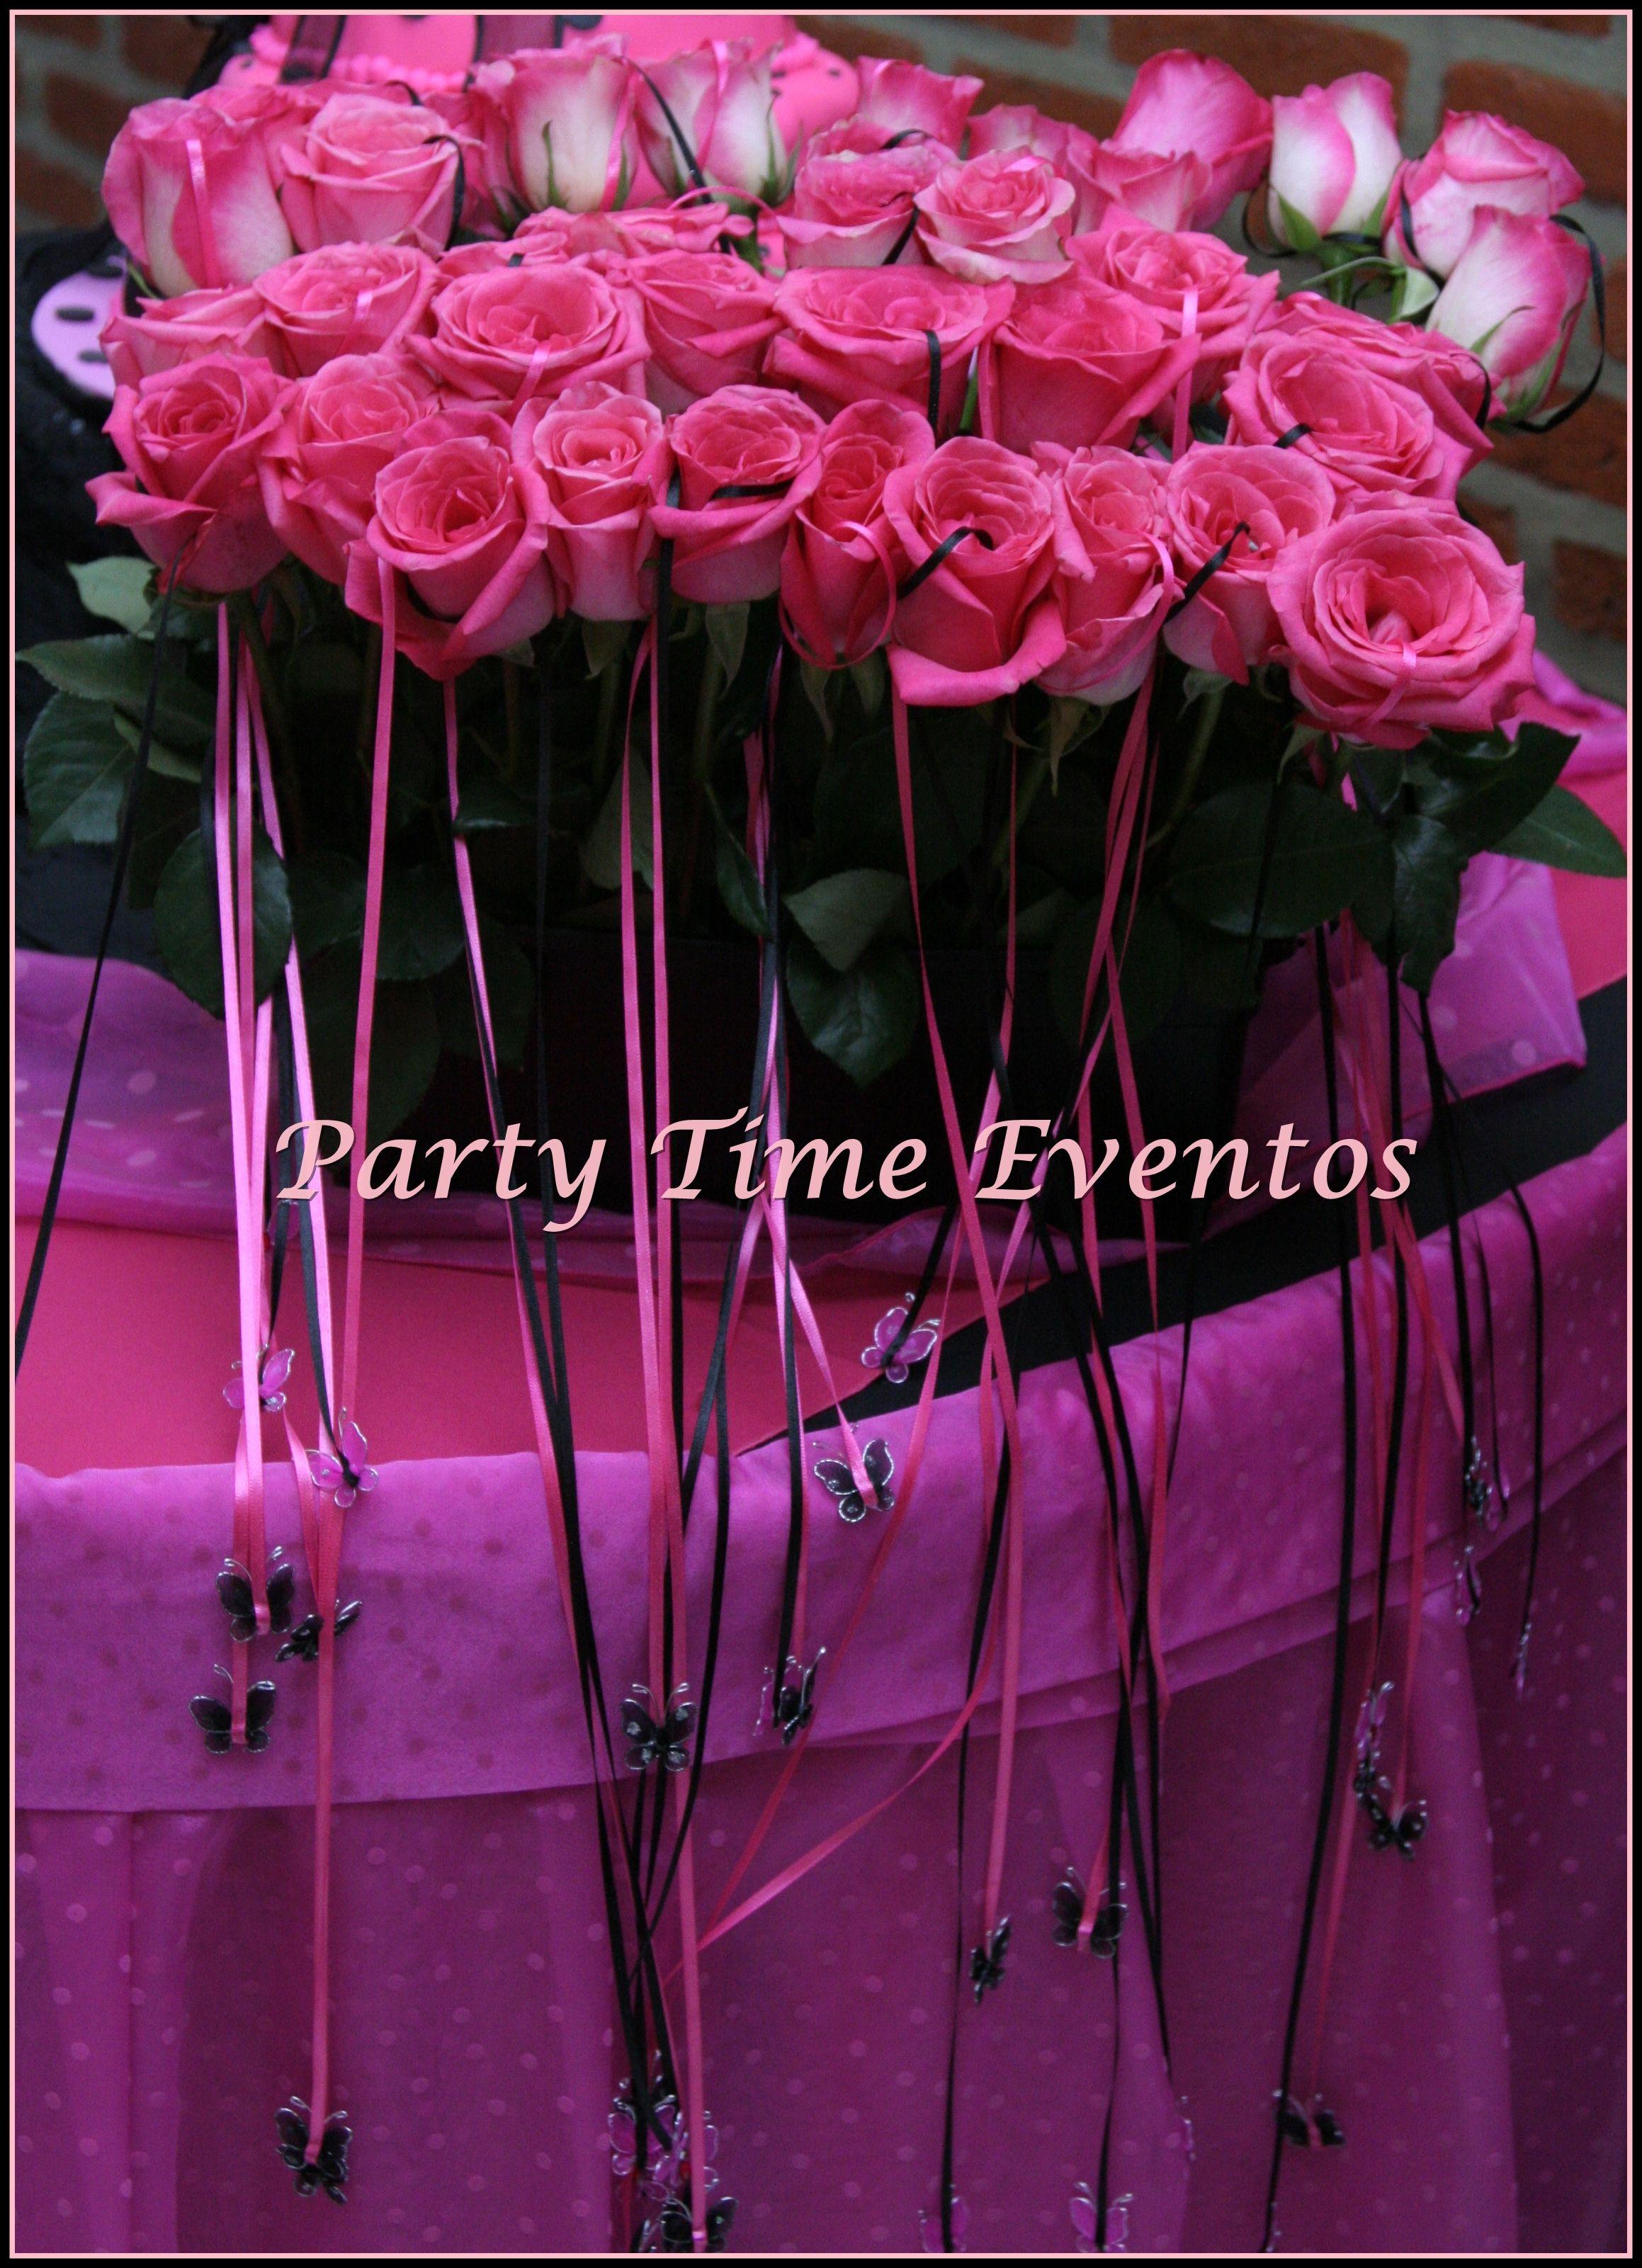 Ceremonia De Cintas Con Rosas Naturales 15 A 241 Os De Mili